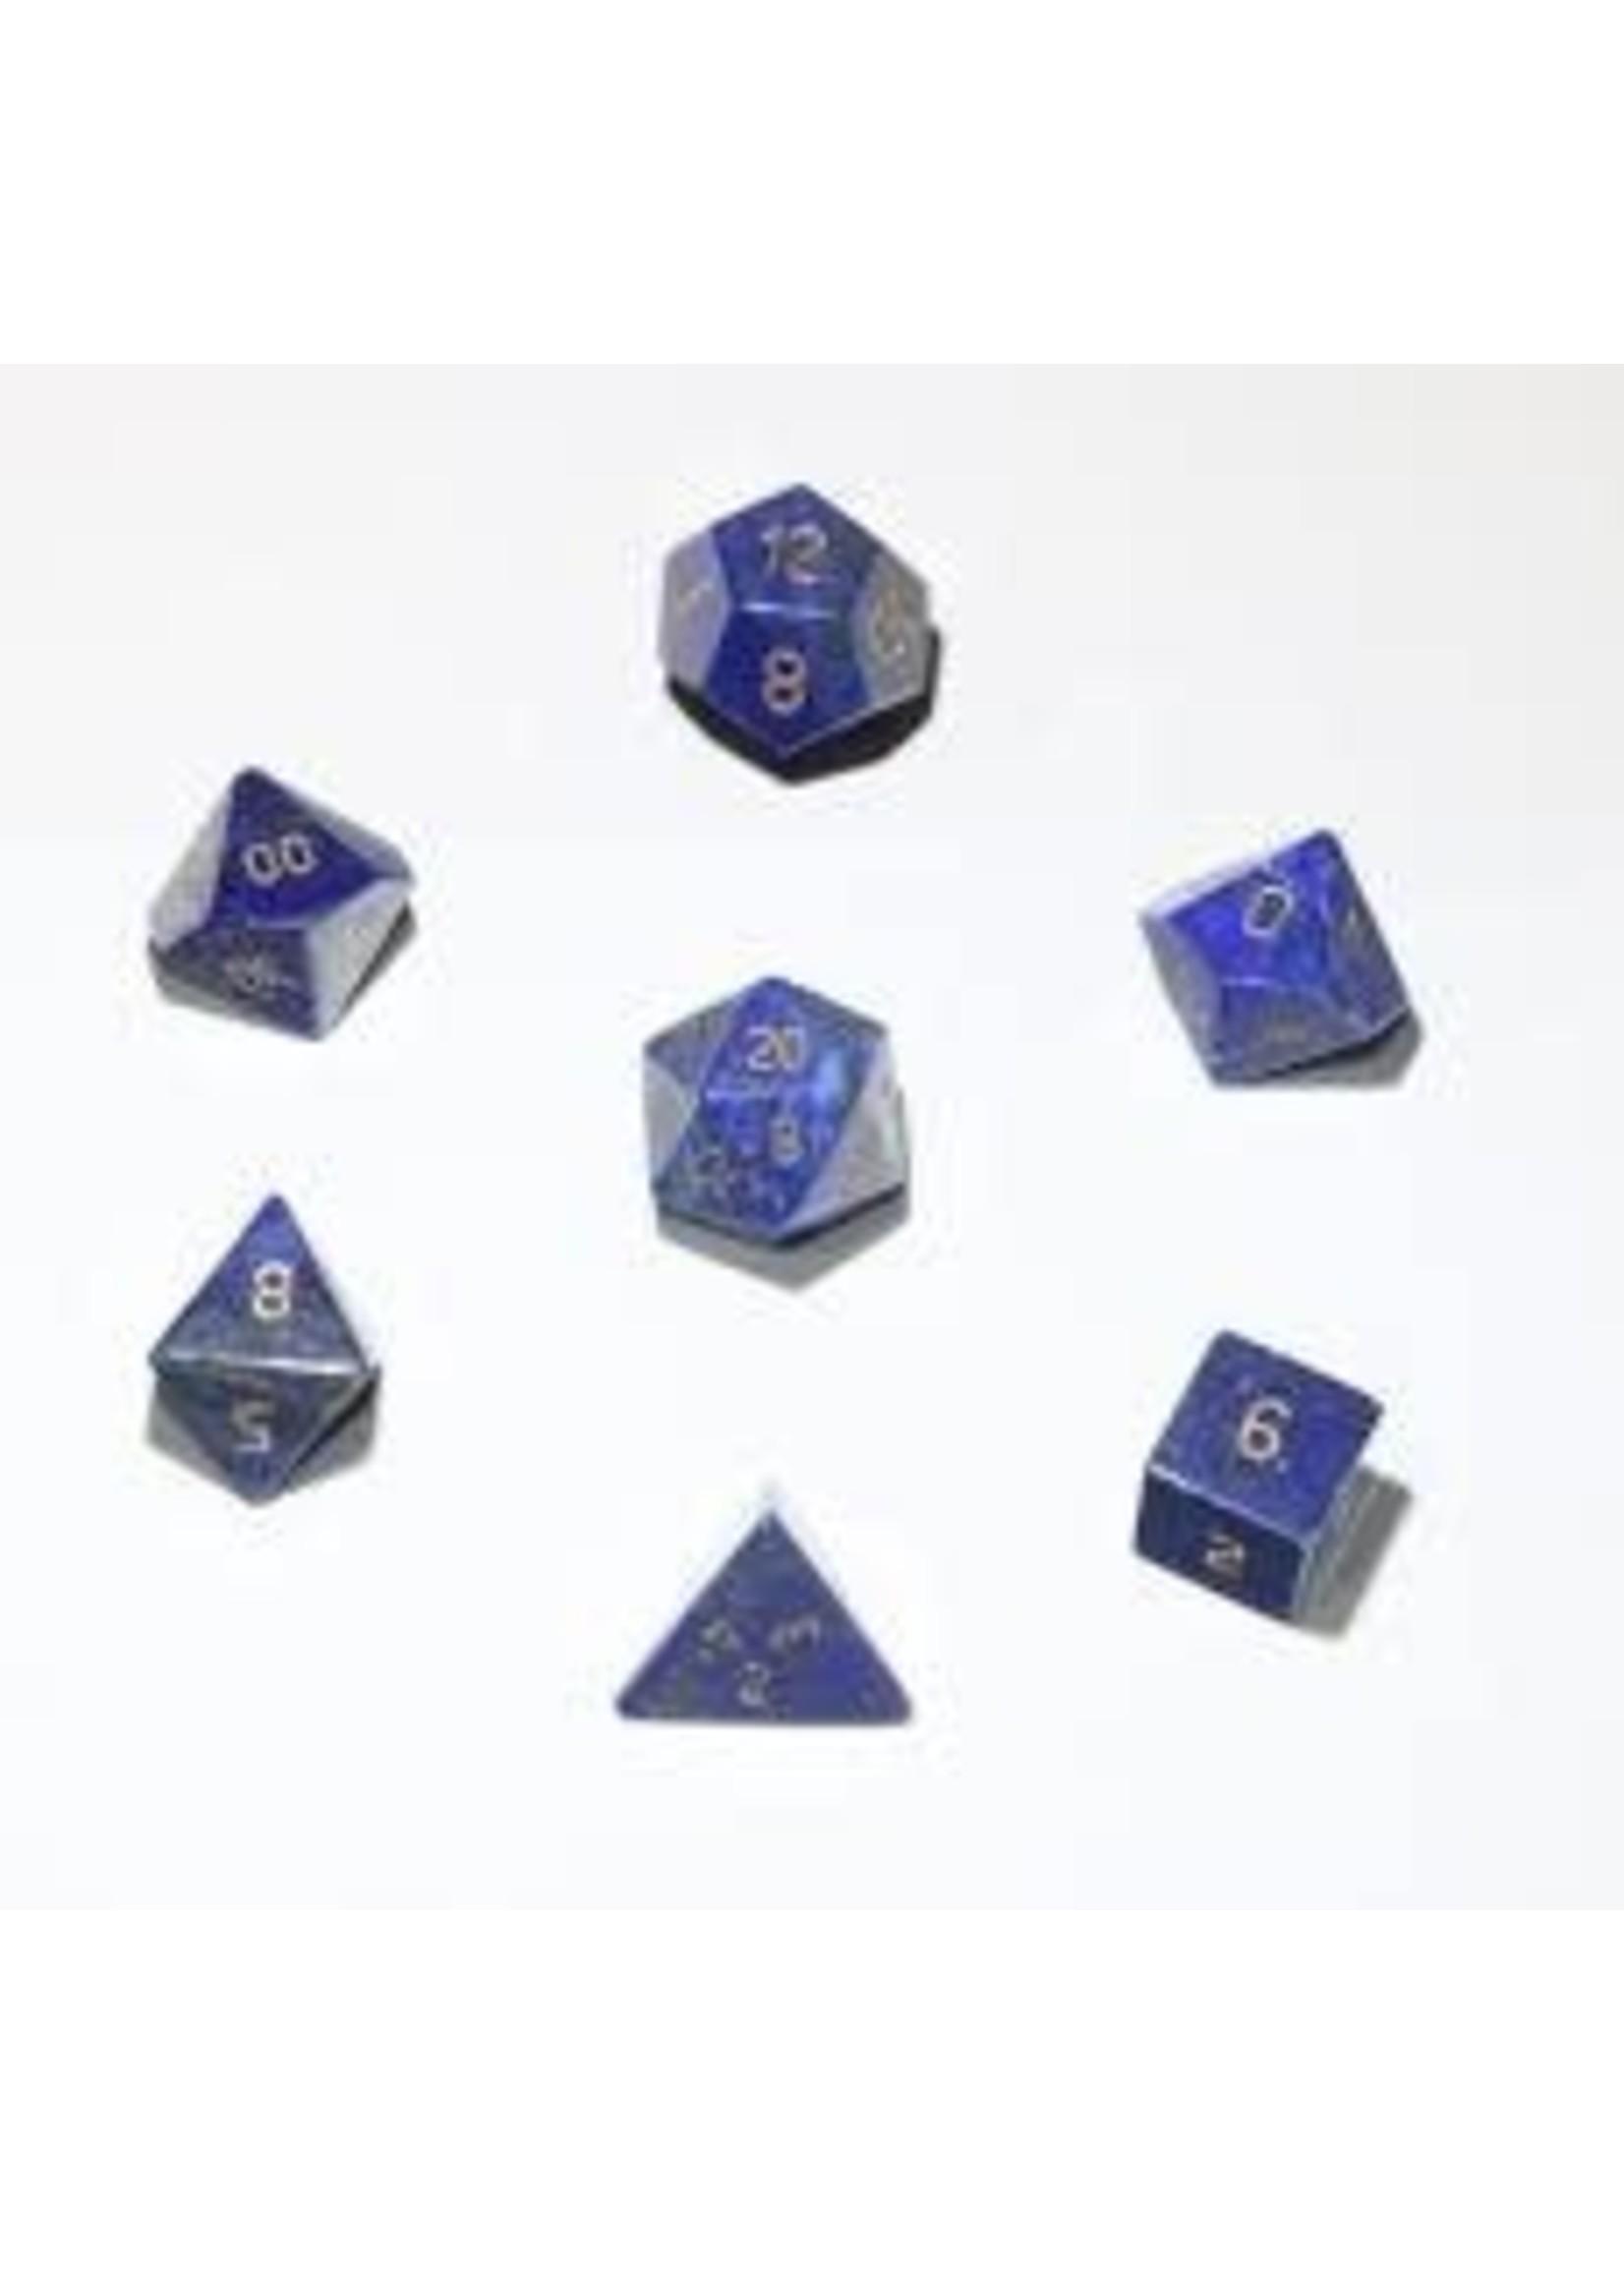 Crystal Caste 16mm Lapis - large 7 set (gold numbers)